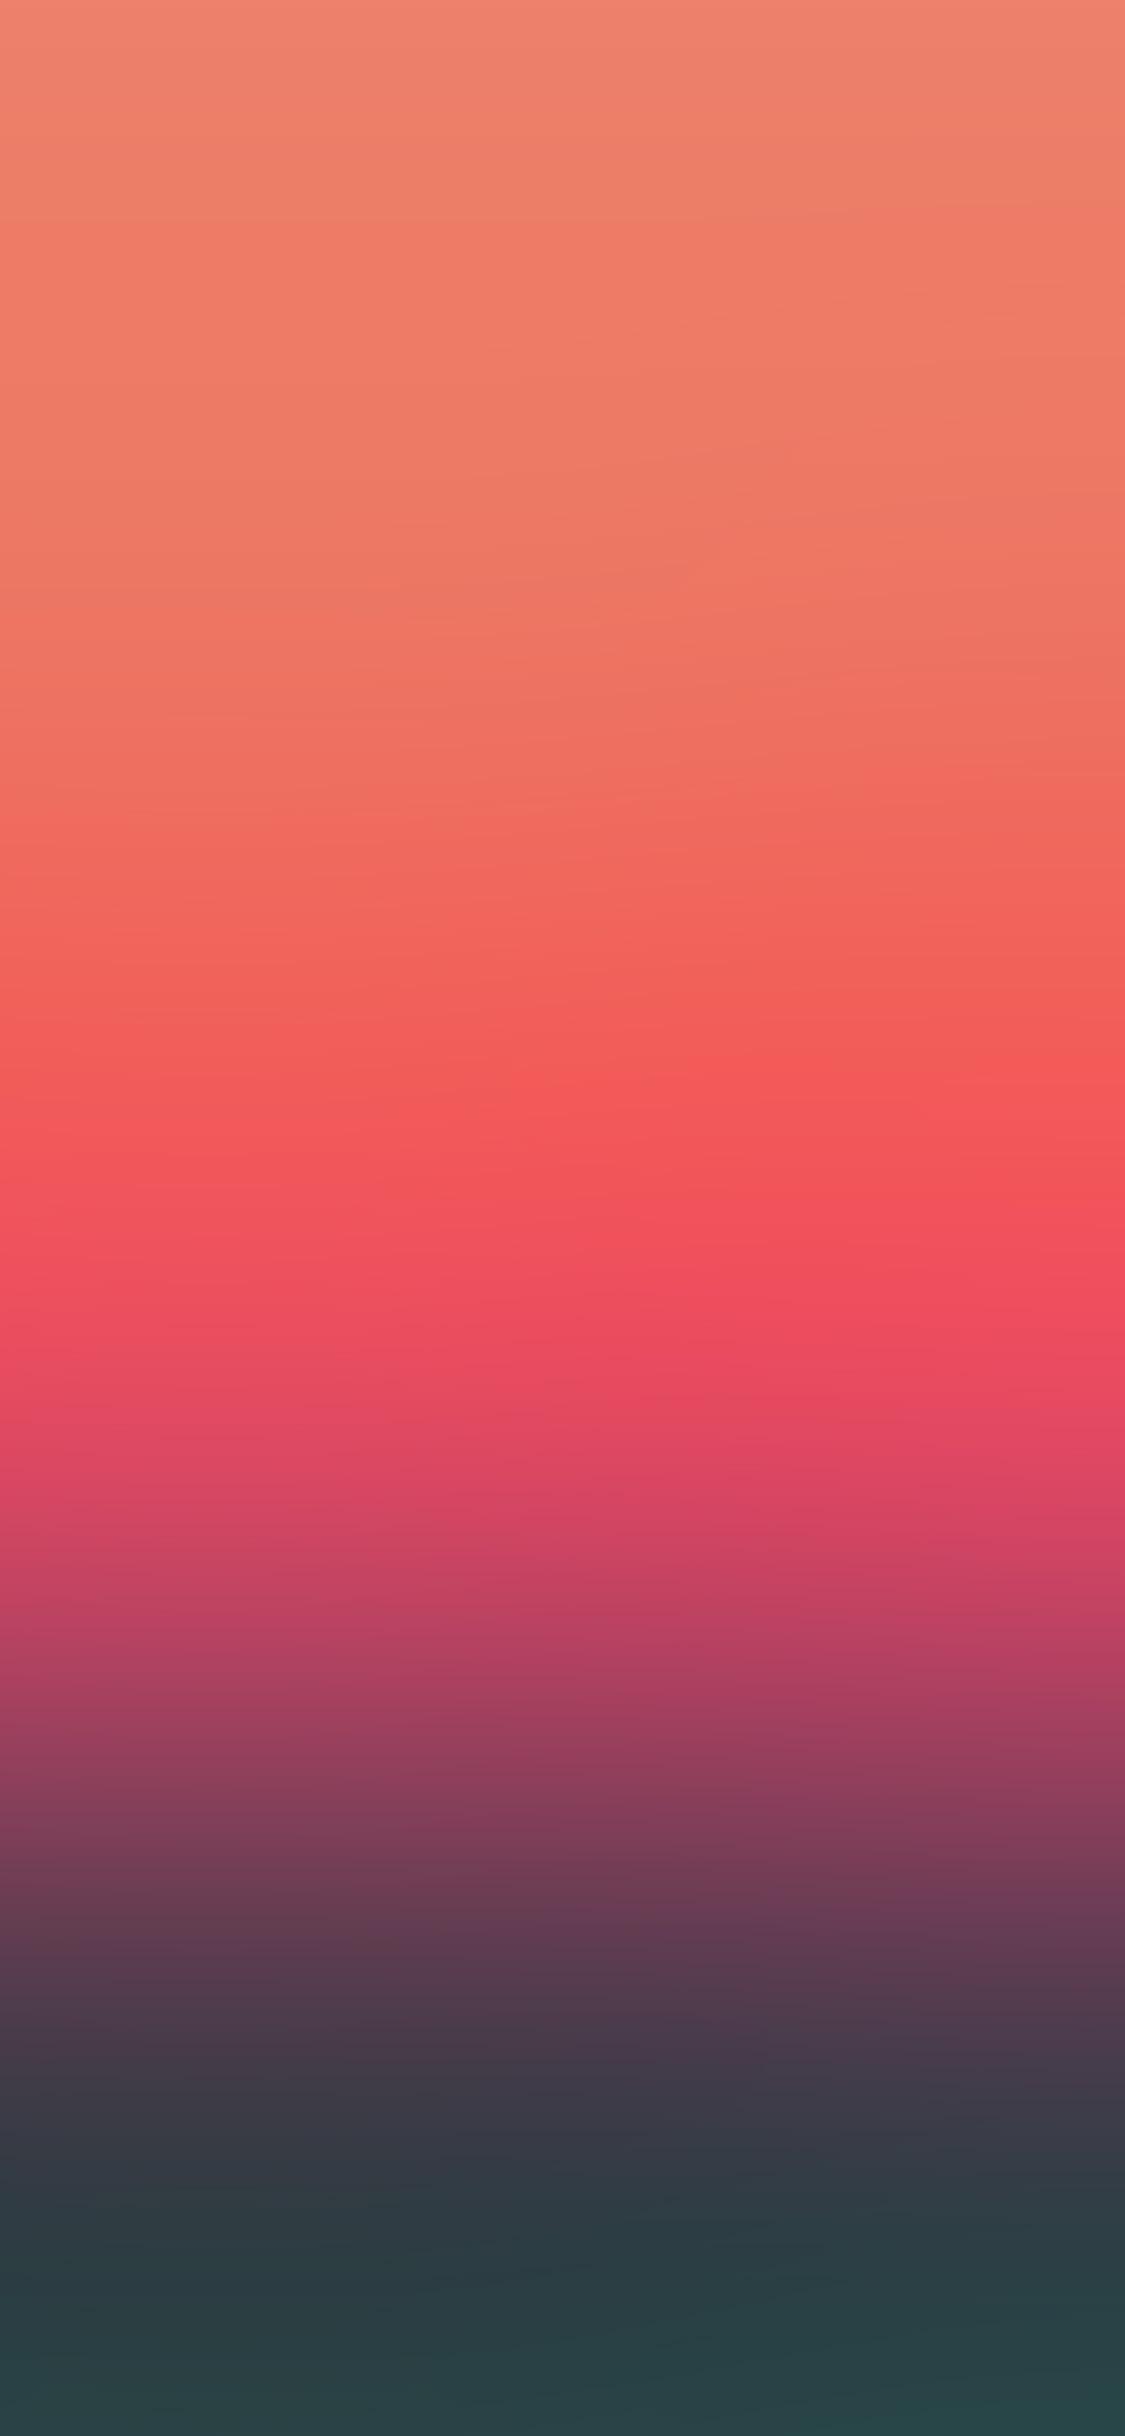 iPhoneXpapers.com-Apple-iPhone-wallpaper-sl80-peace-blue-dark-blur-gradation